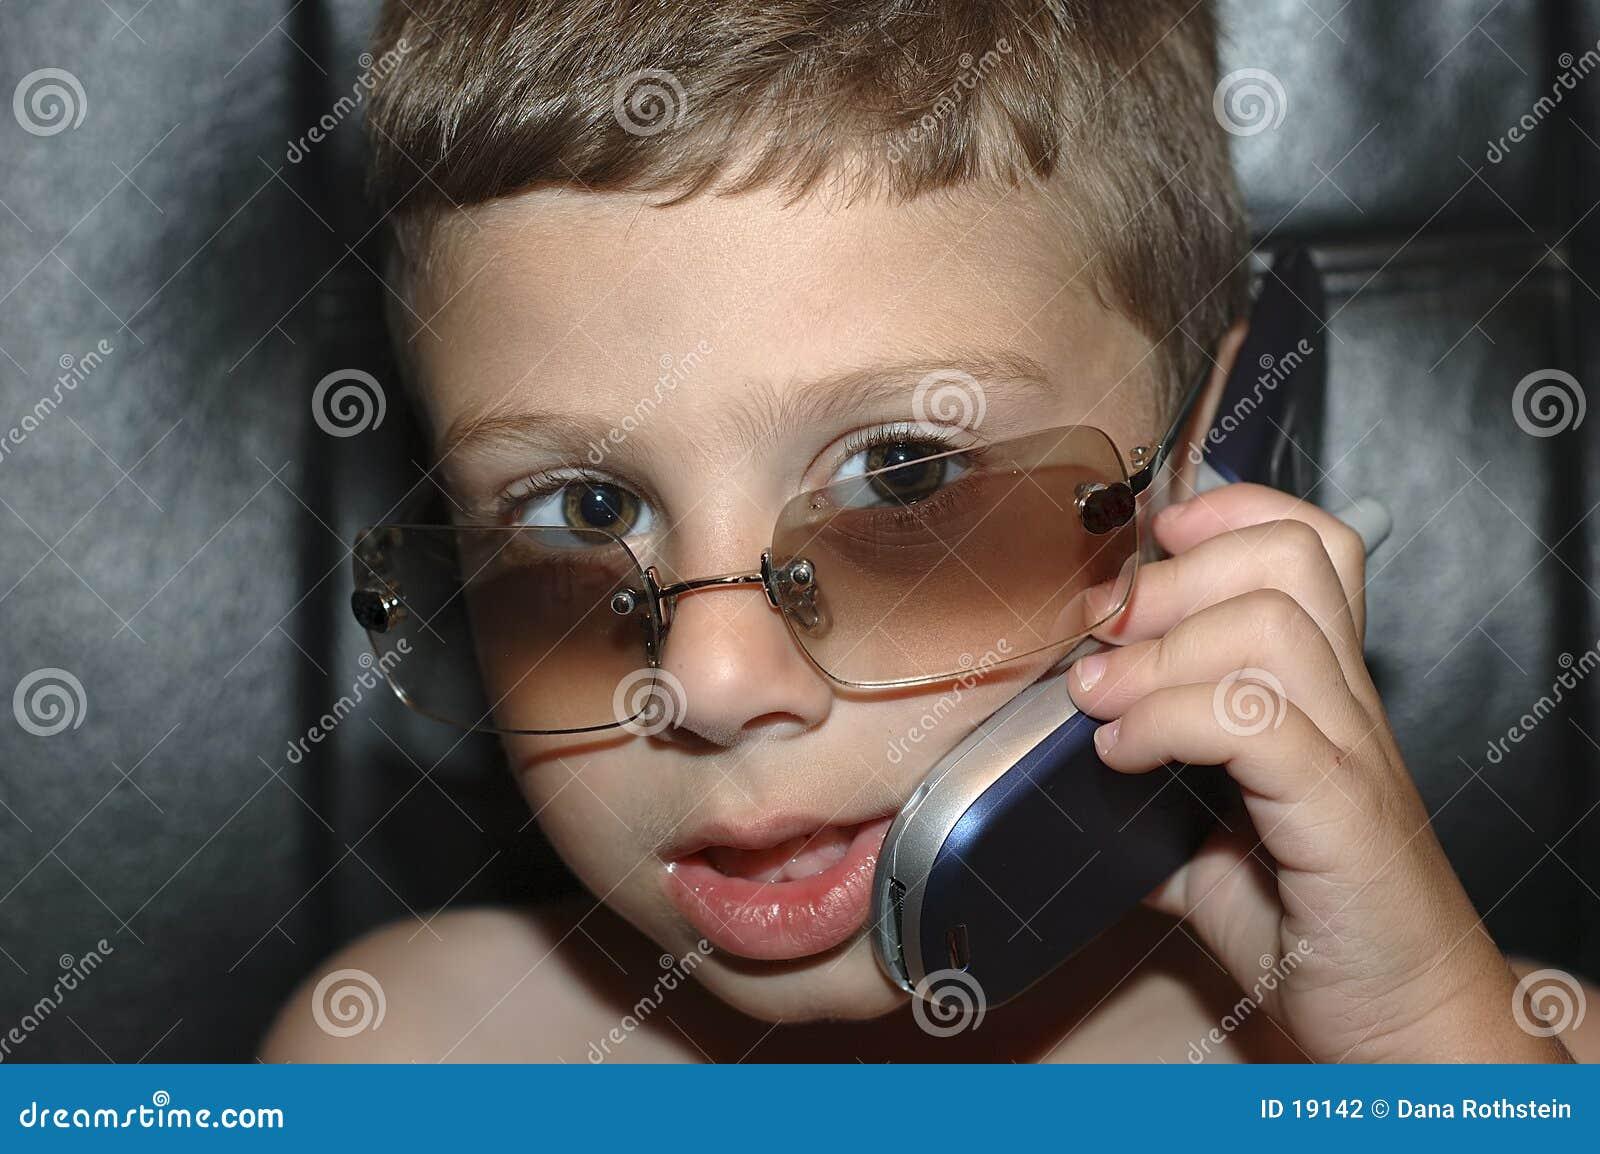 Calling Nanna